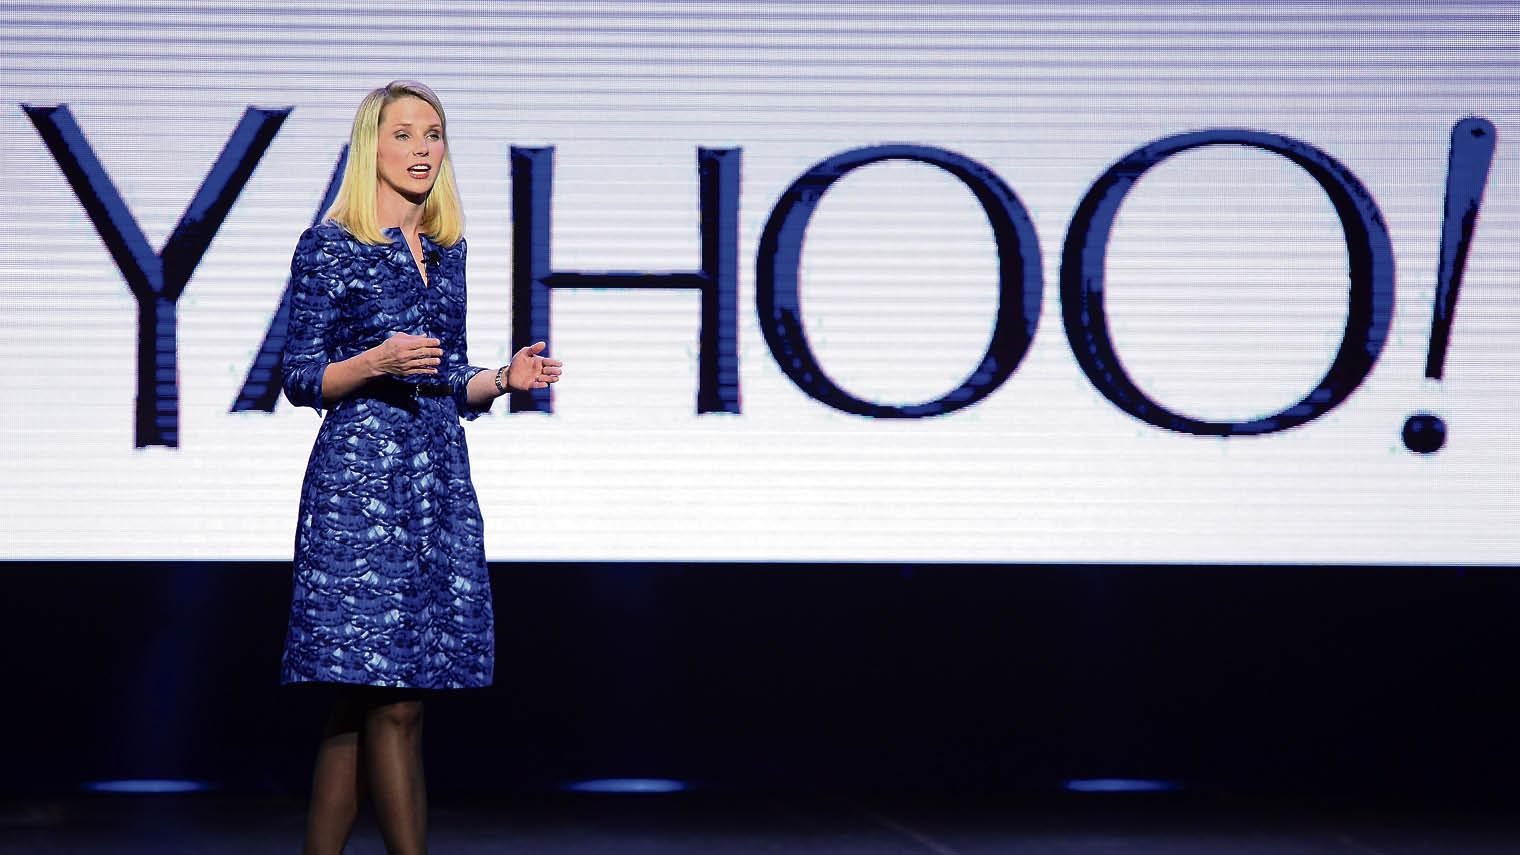 Marissa Mayer of Yahoo